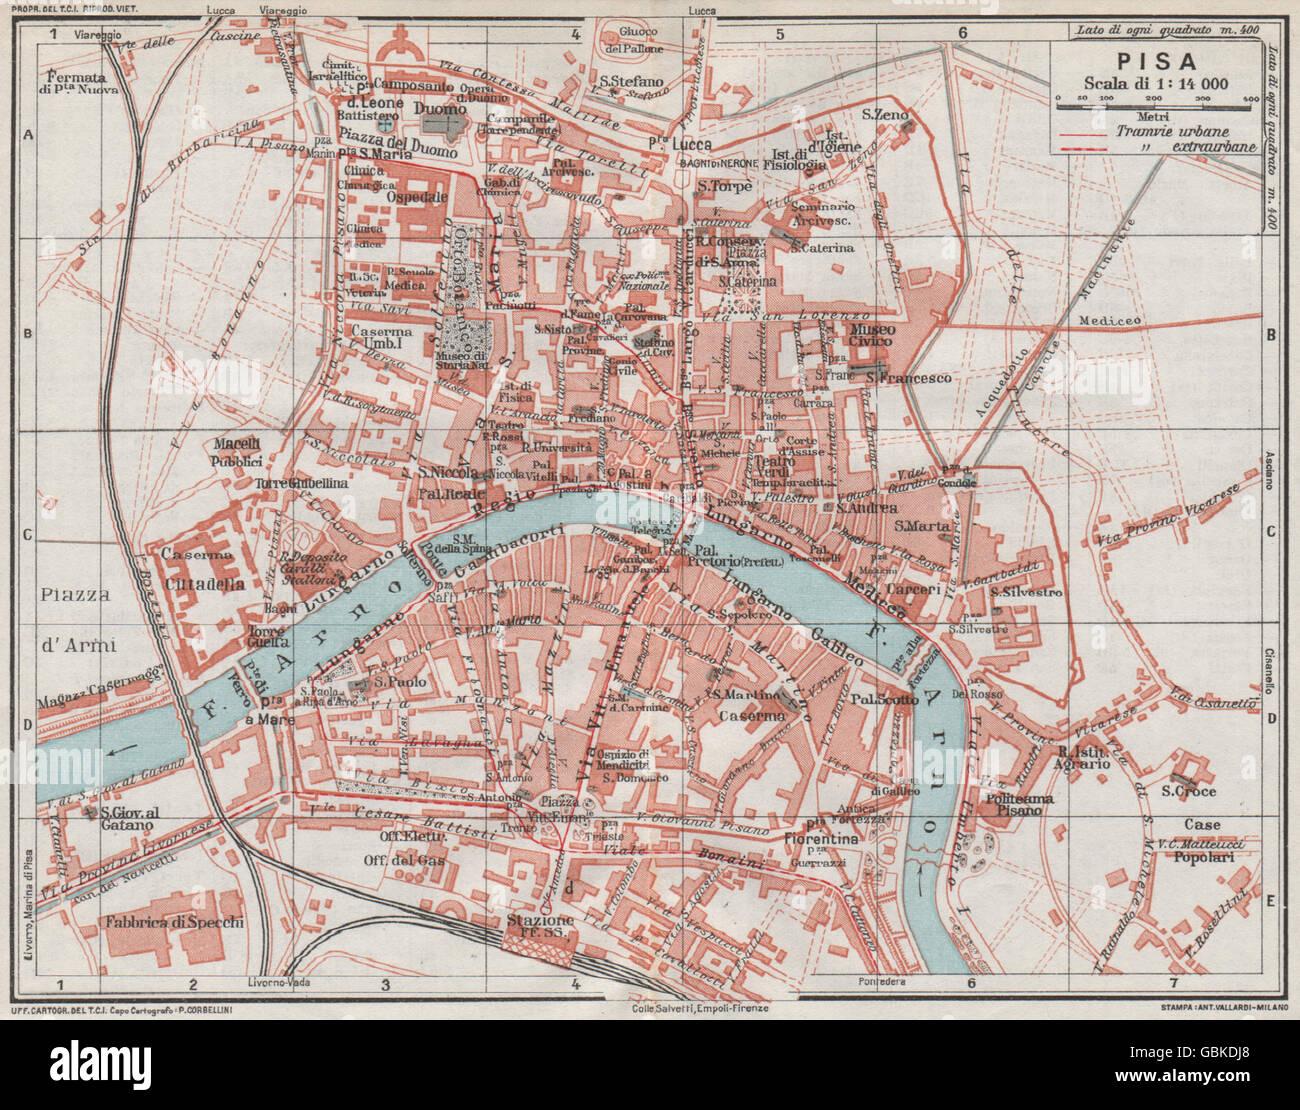 Pisa Map L Map Chicago Map Gps - Pisa bus map